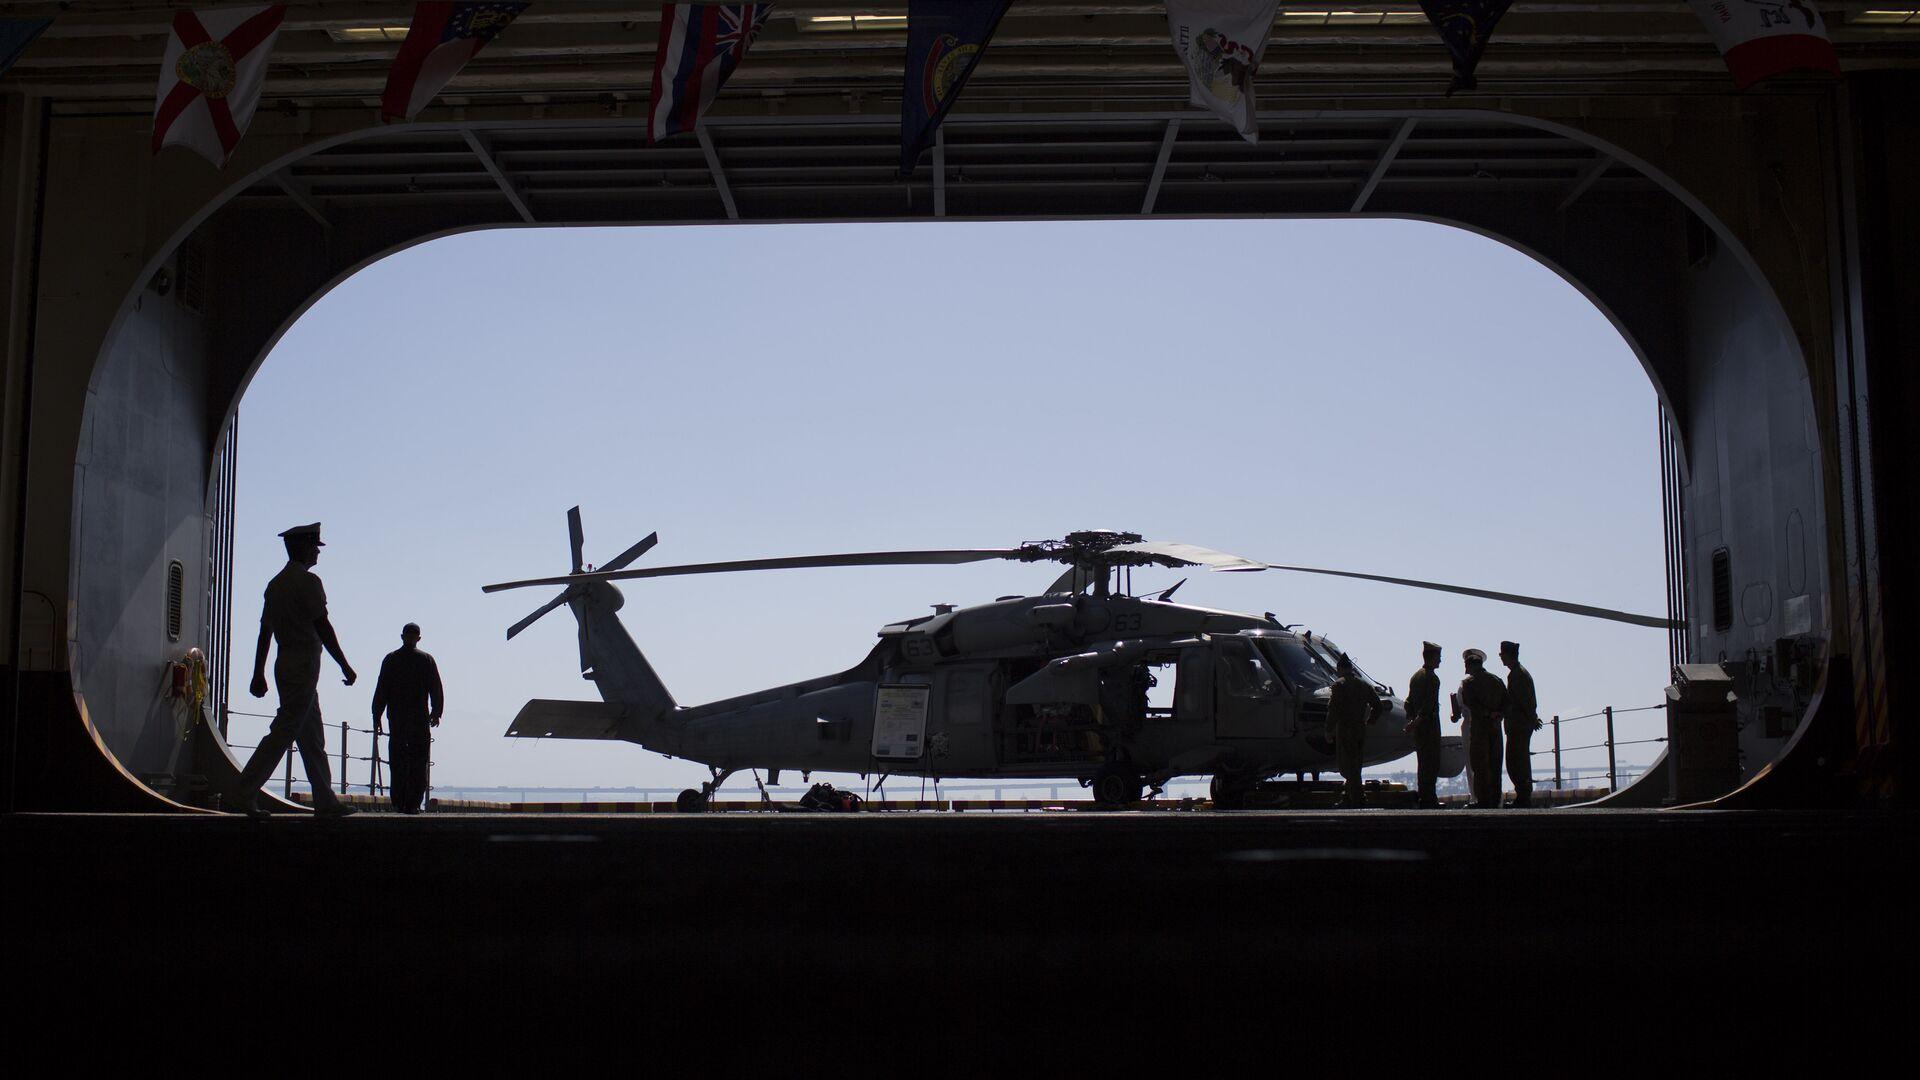 Helicóptero Sikorsky MH-60 Seahawk de la Marina de Guerra de EEUU (archivo) - Sputnik Mundo, 1920, 01.09.2021